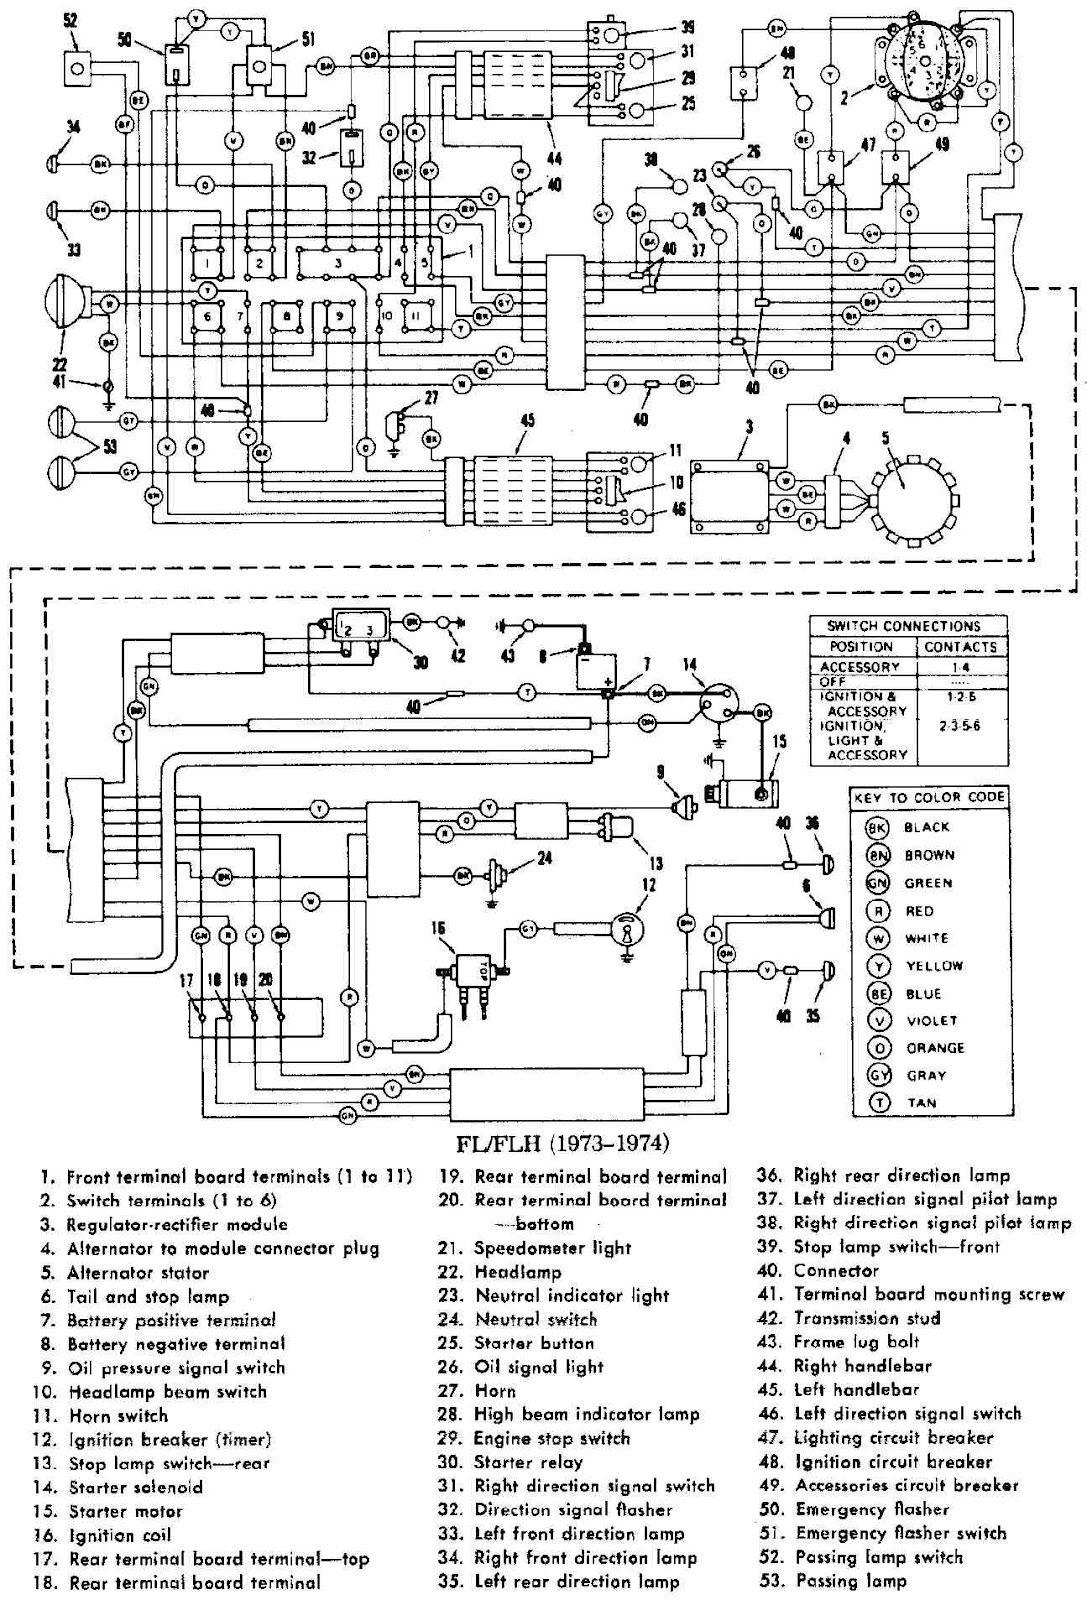 2014 sportster wiring diagram da 8006  harley ultra classic wiring diagram on harley street  harley ultra classic wiring diagram on